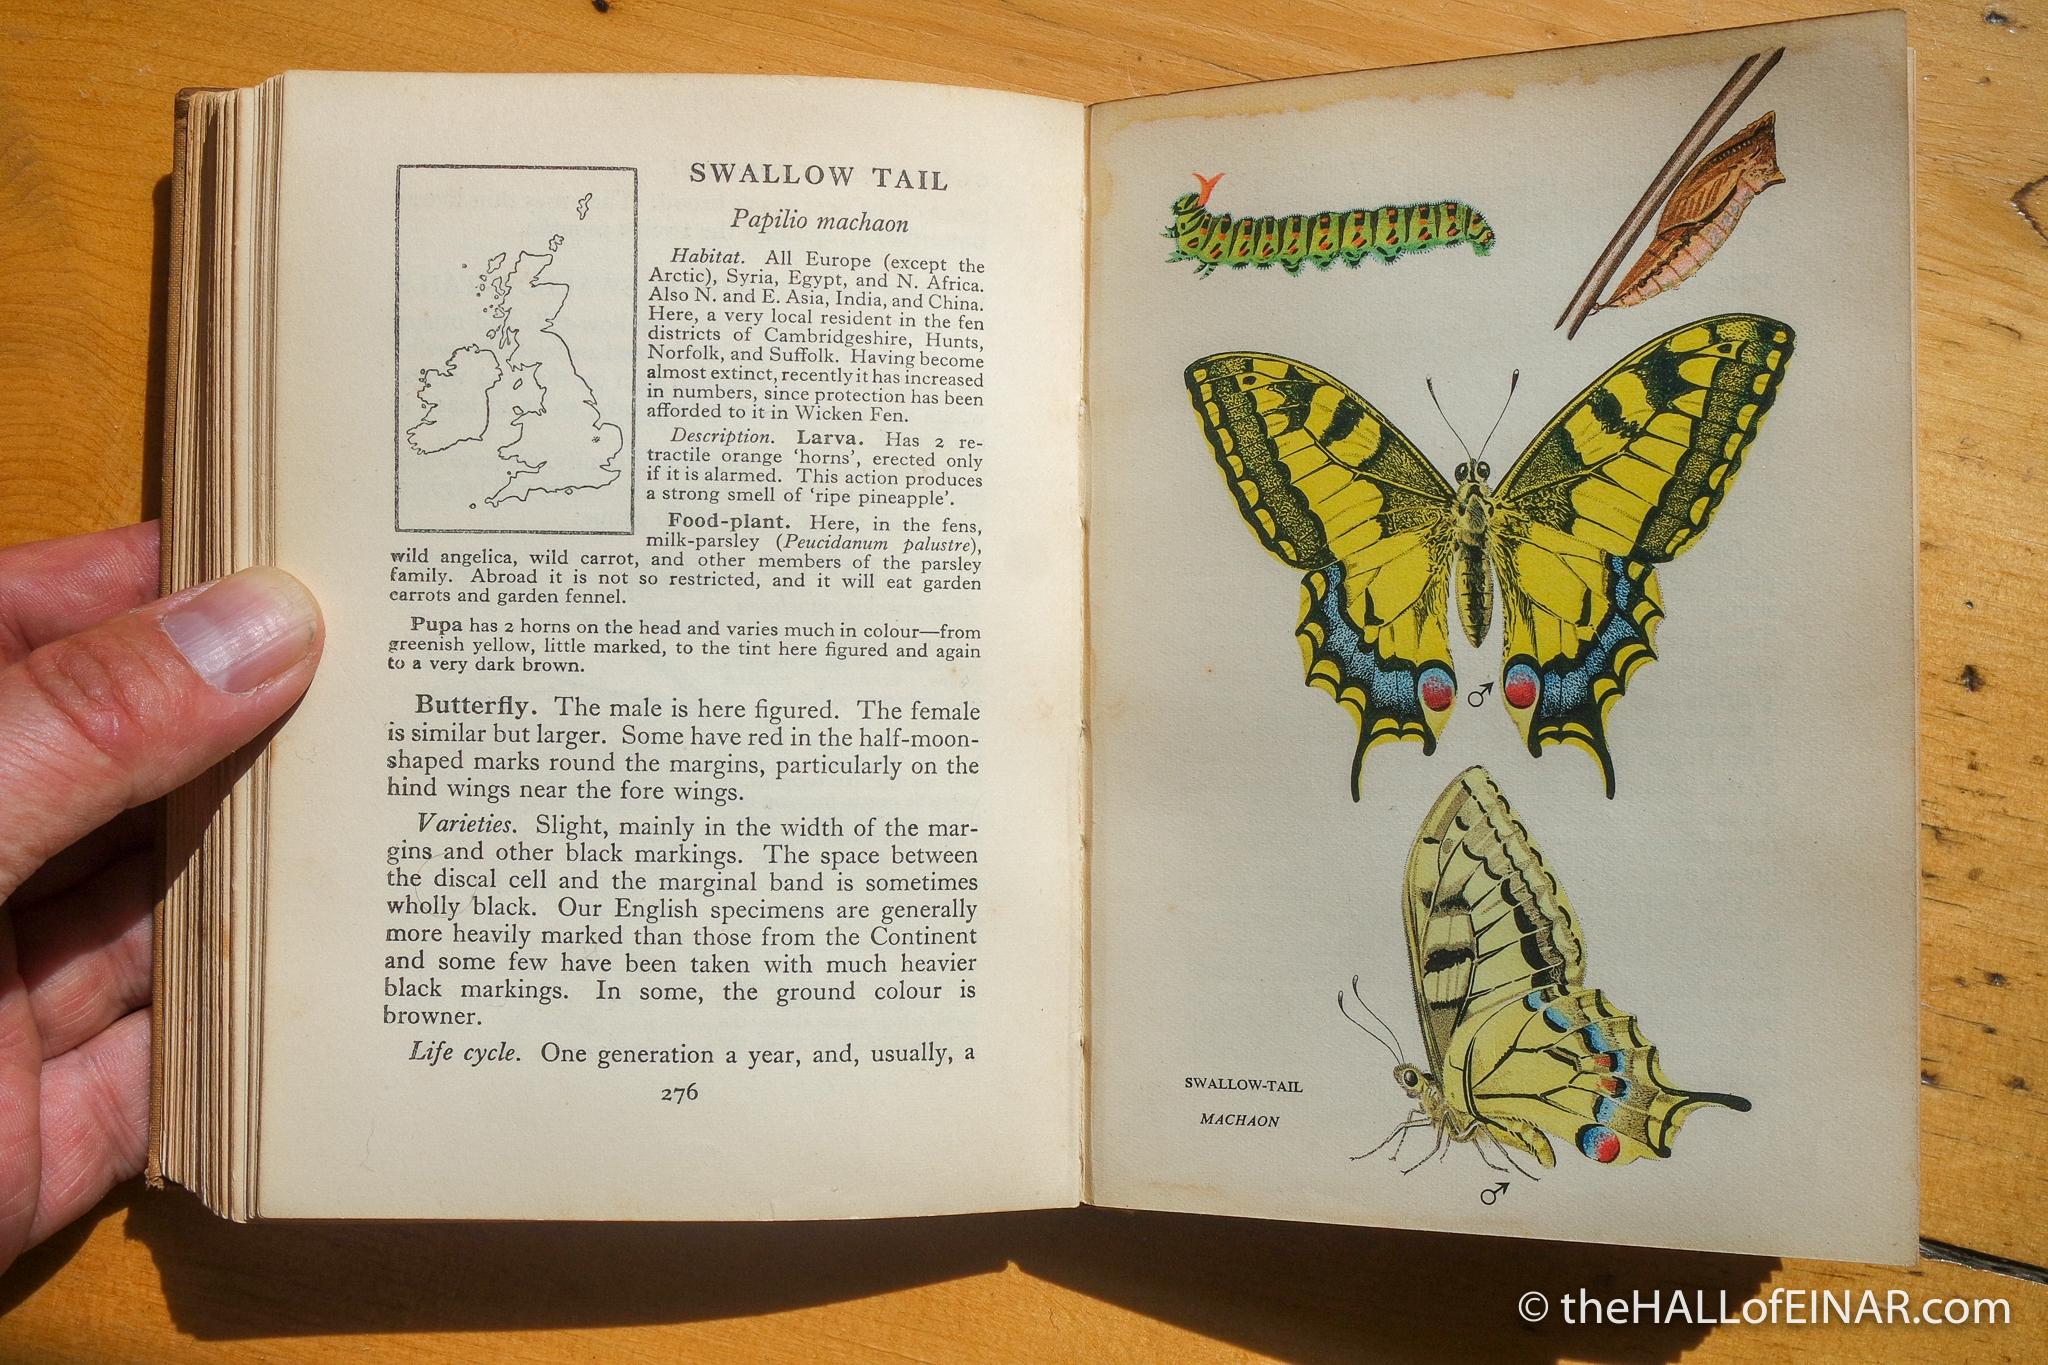 Swallowtail - Edmund Sandars